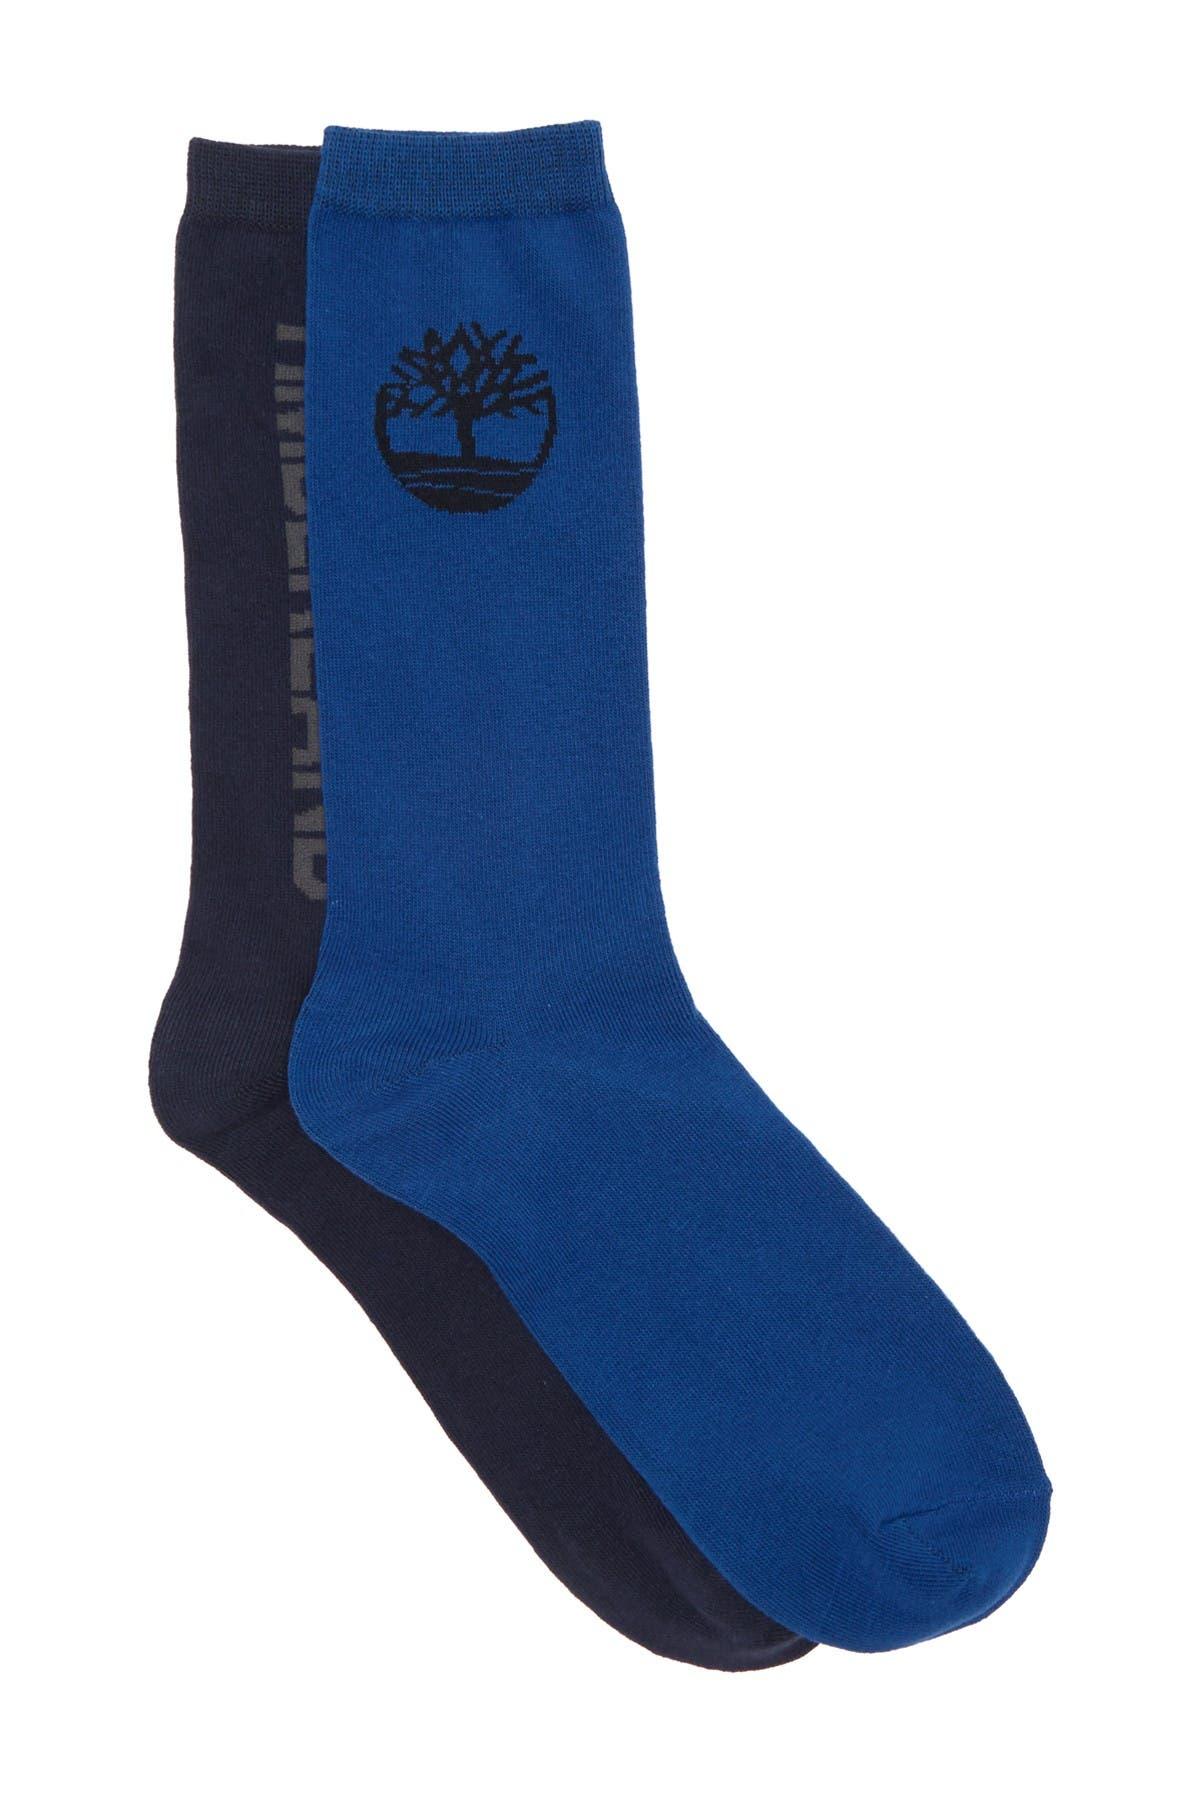 Image of Timberland Logo Fashion Crew Socks - Pack of 2